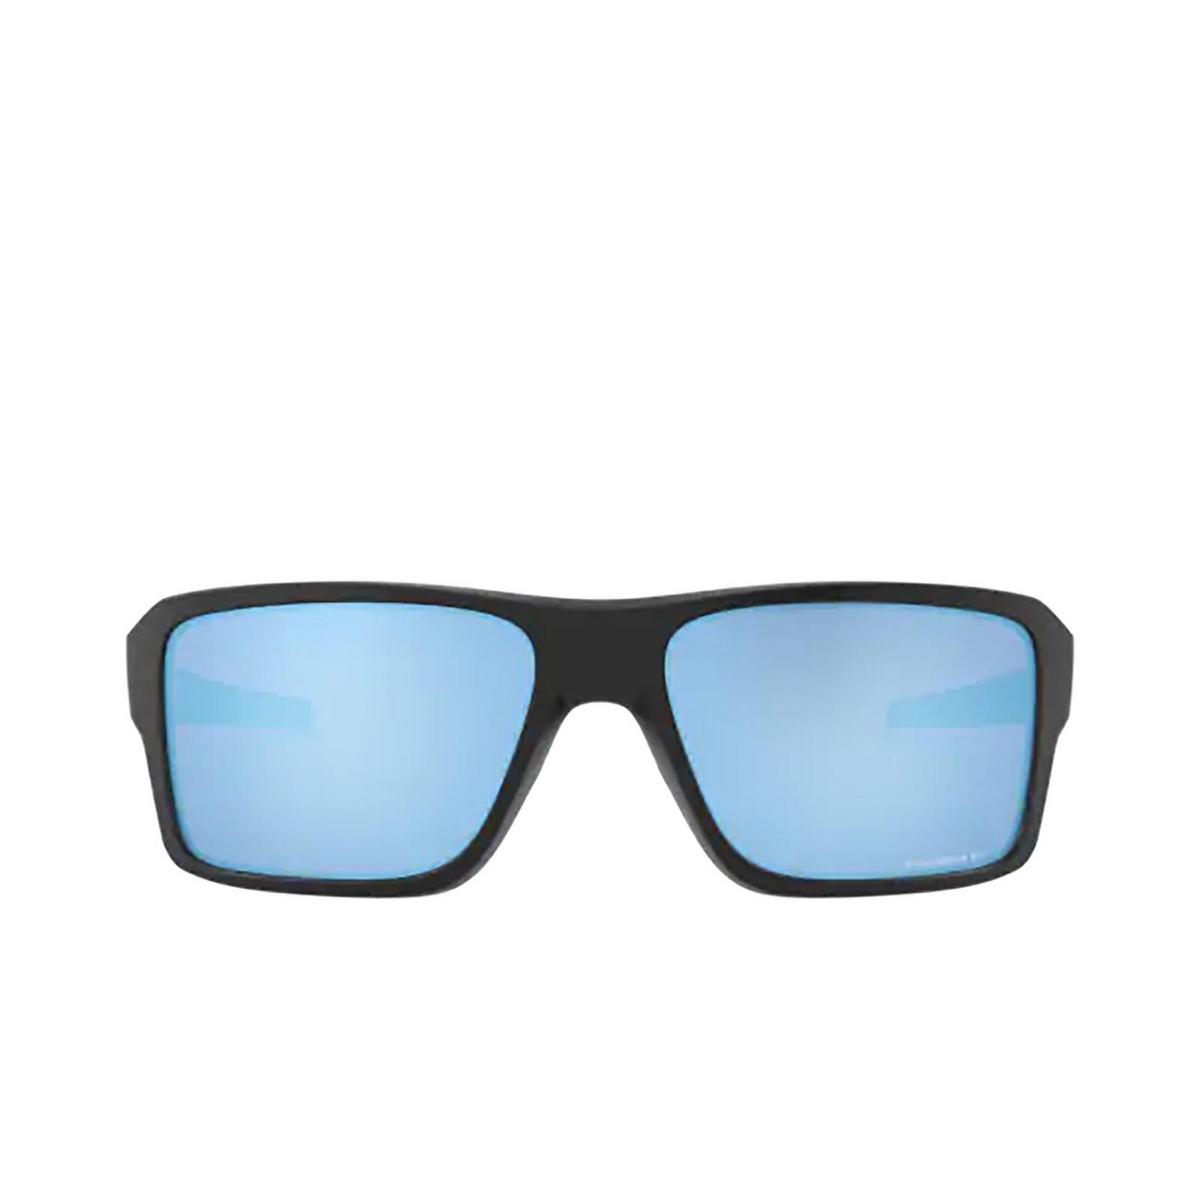 Oakley® Rectangle Sunglasses: Double Edge OO9380 color Matte Black 938013 - front view.